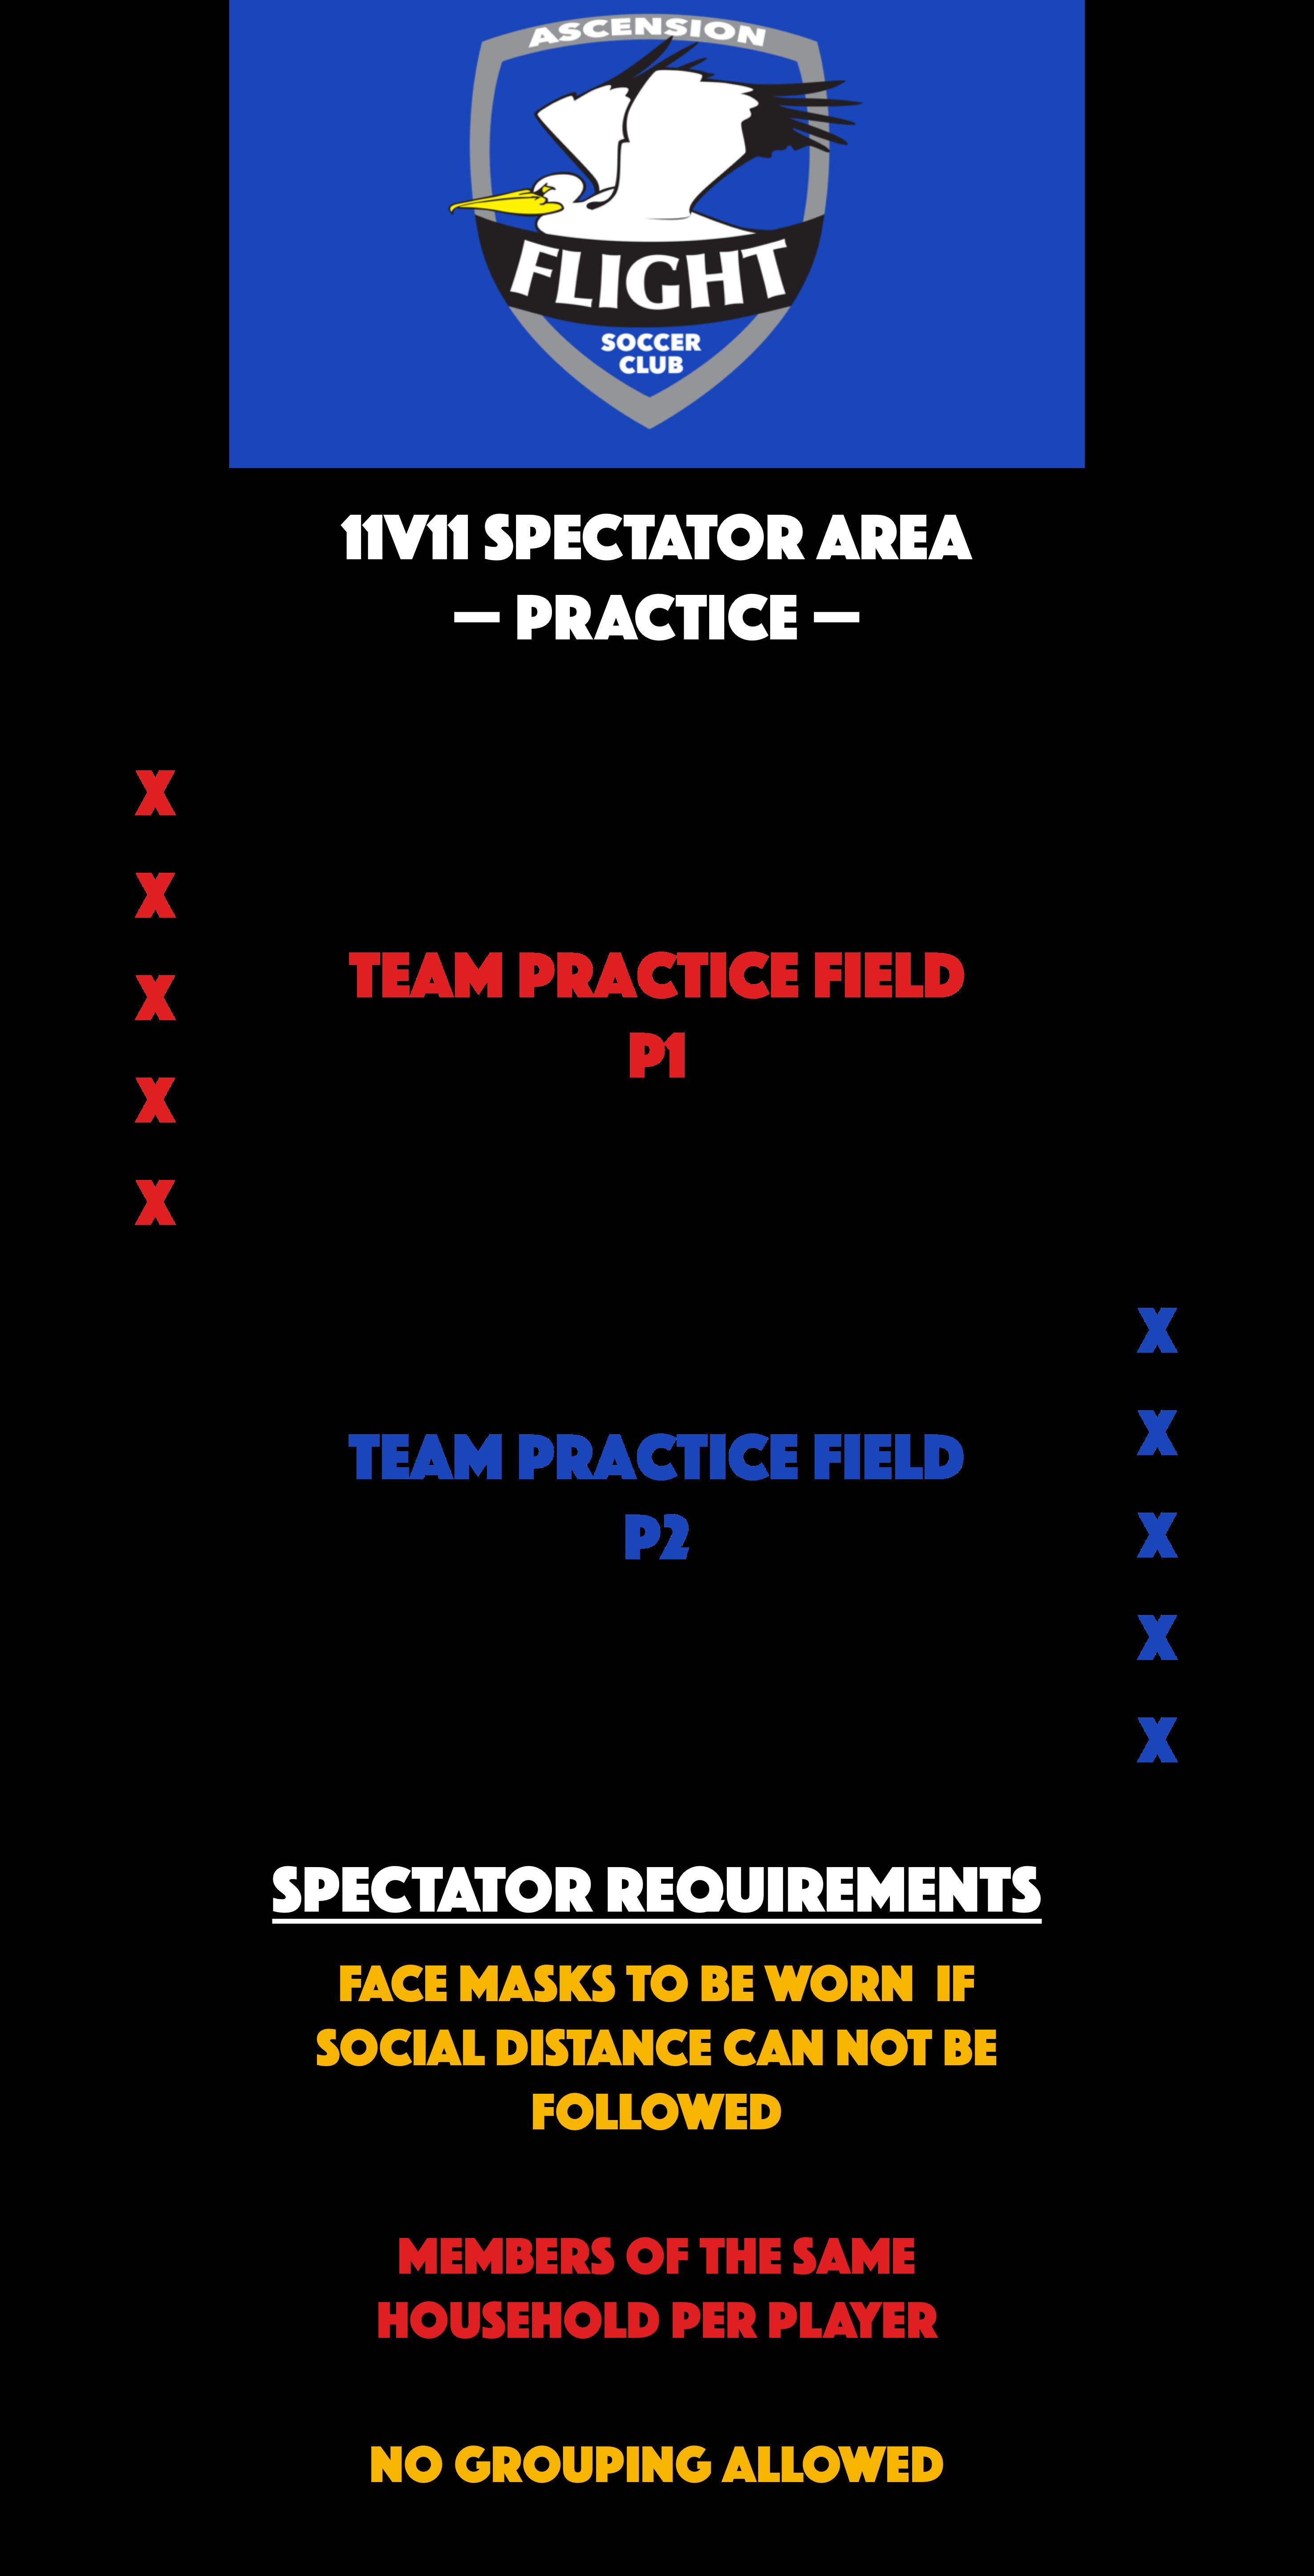 Rec 11v11 Spectator Area - Practice